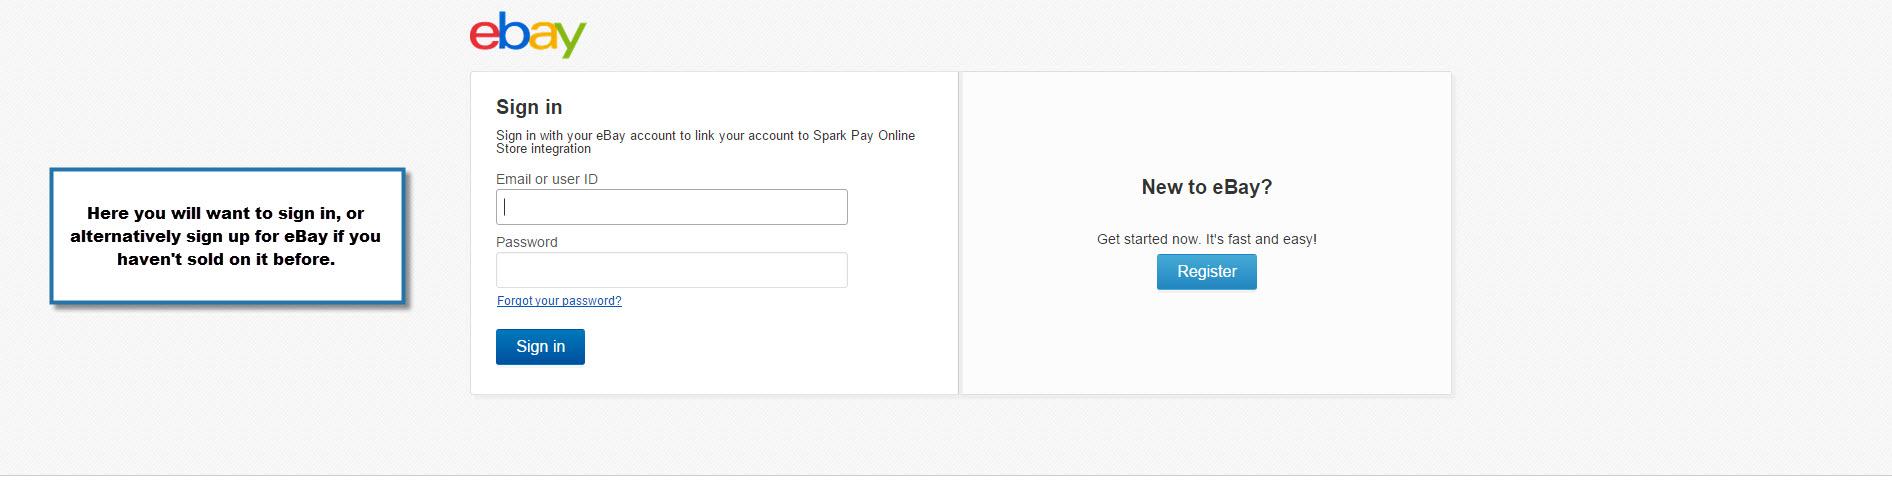 Ebay Integration Knowledge Center